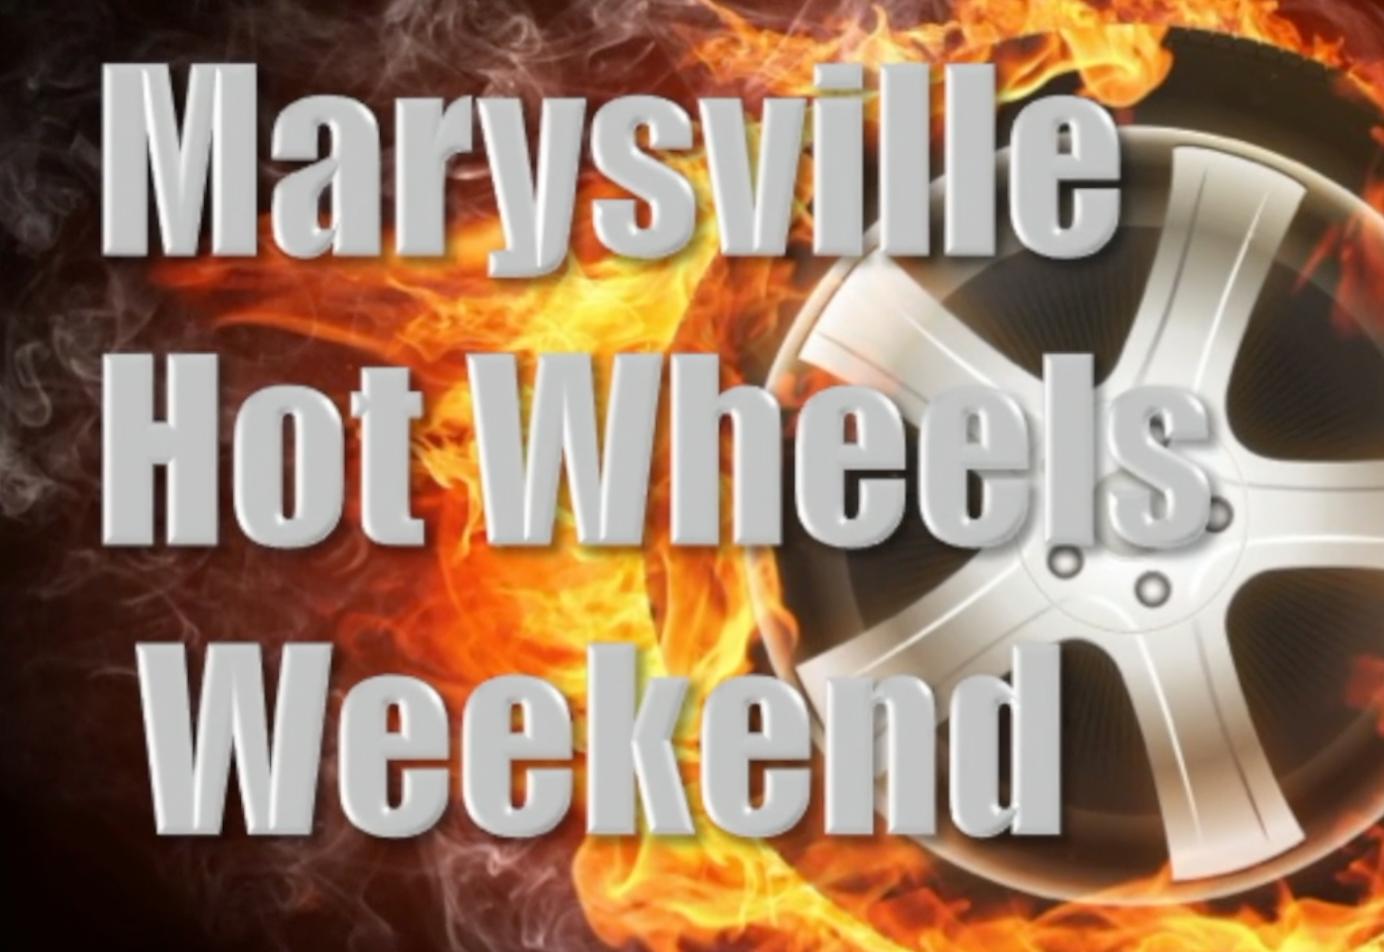 Marysville Hot Wheels Weekend